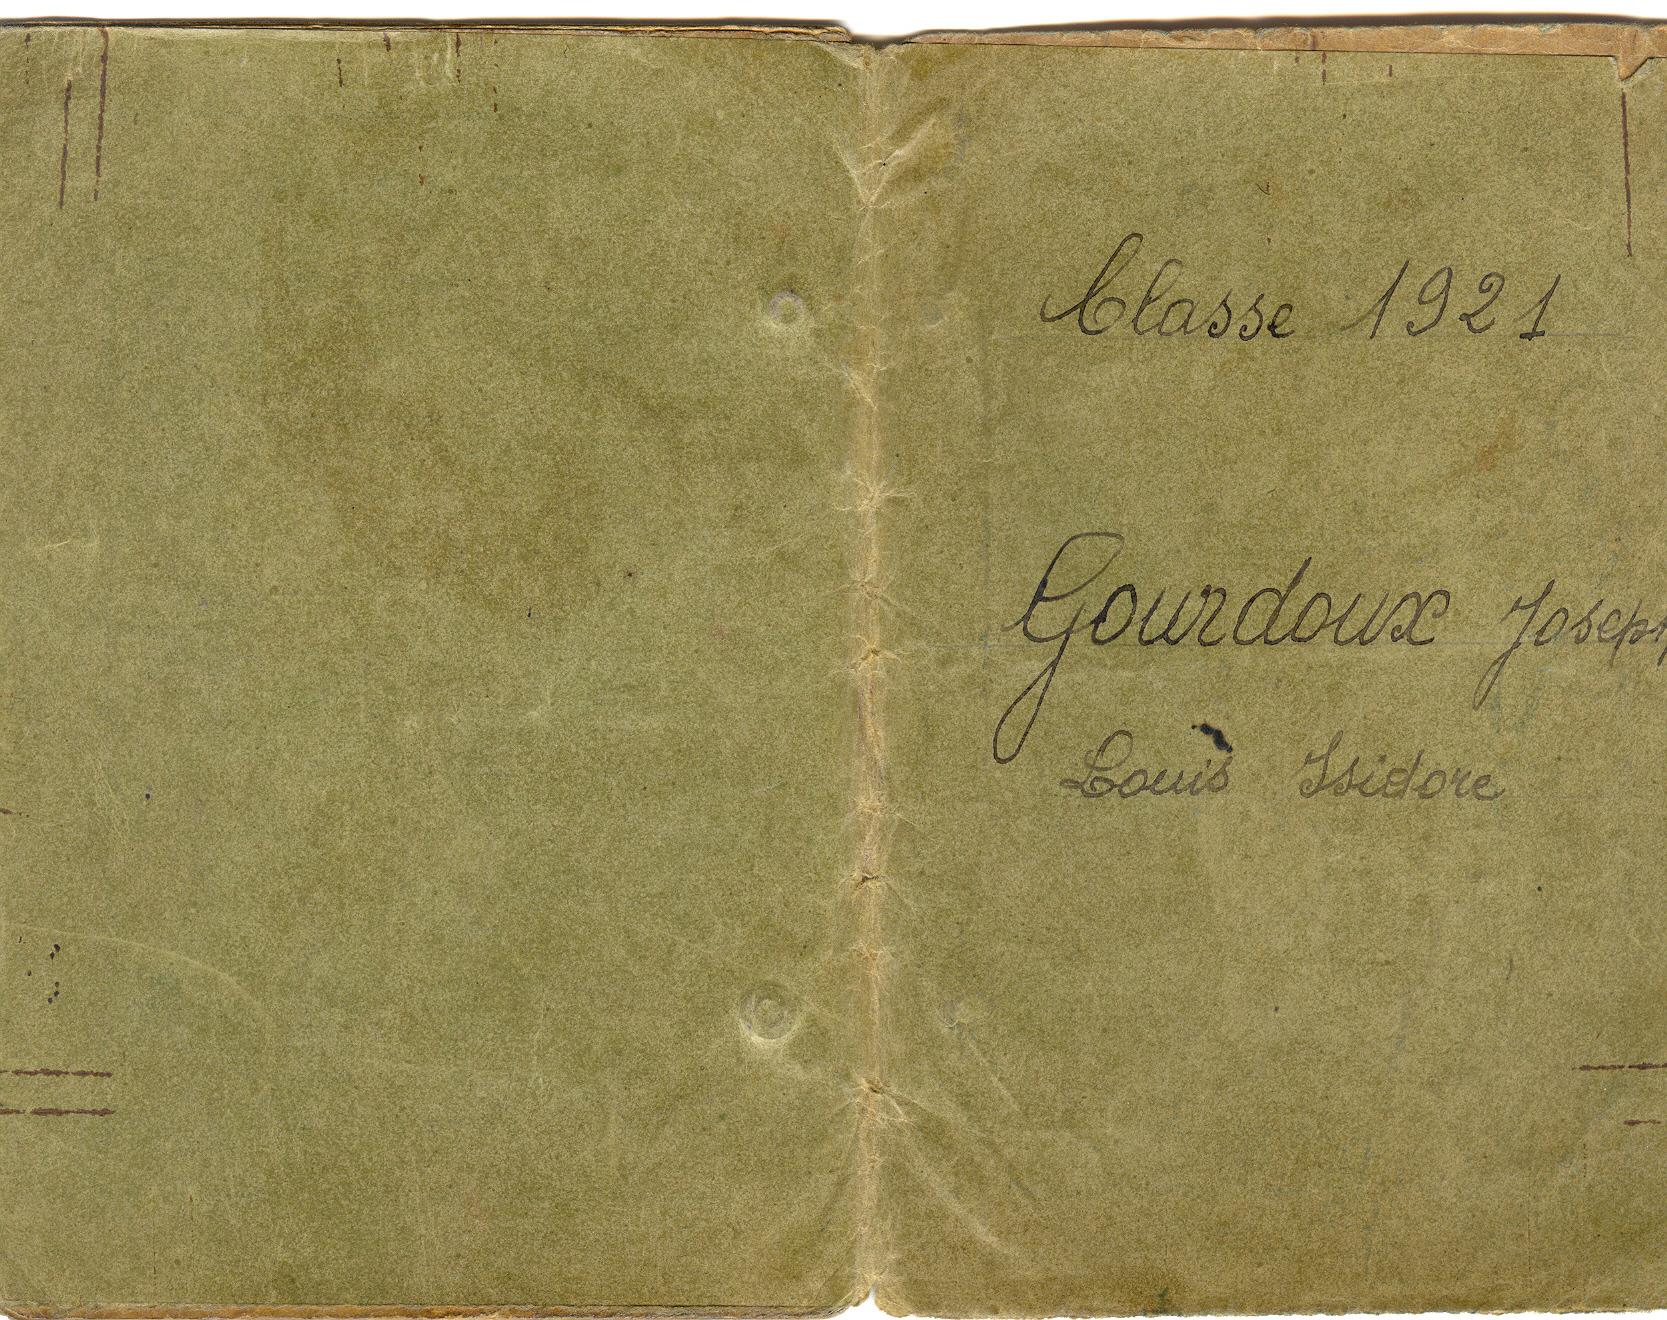 19210401_gourdoux-joseph-louis-isidore_lm_30-nimes1